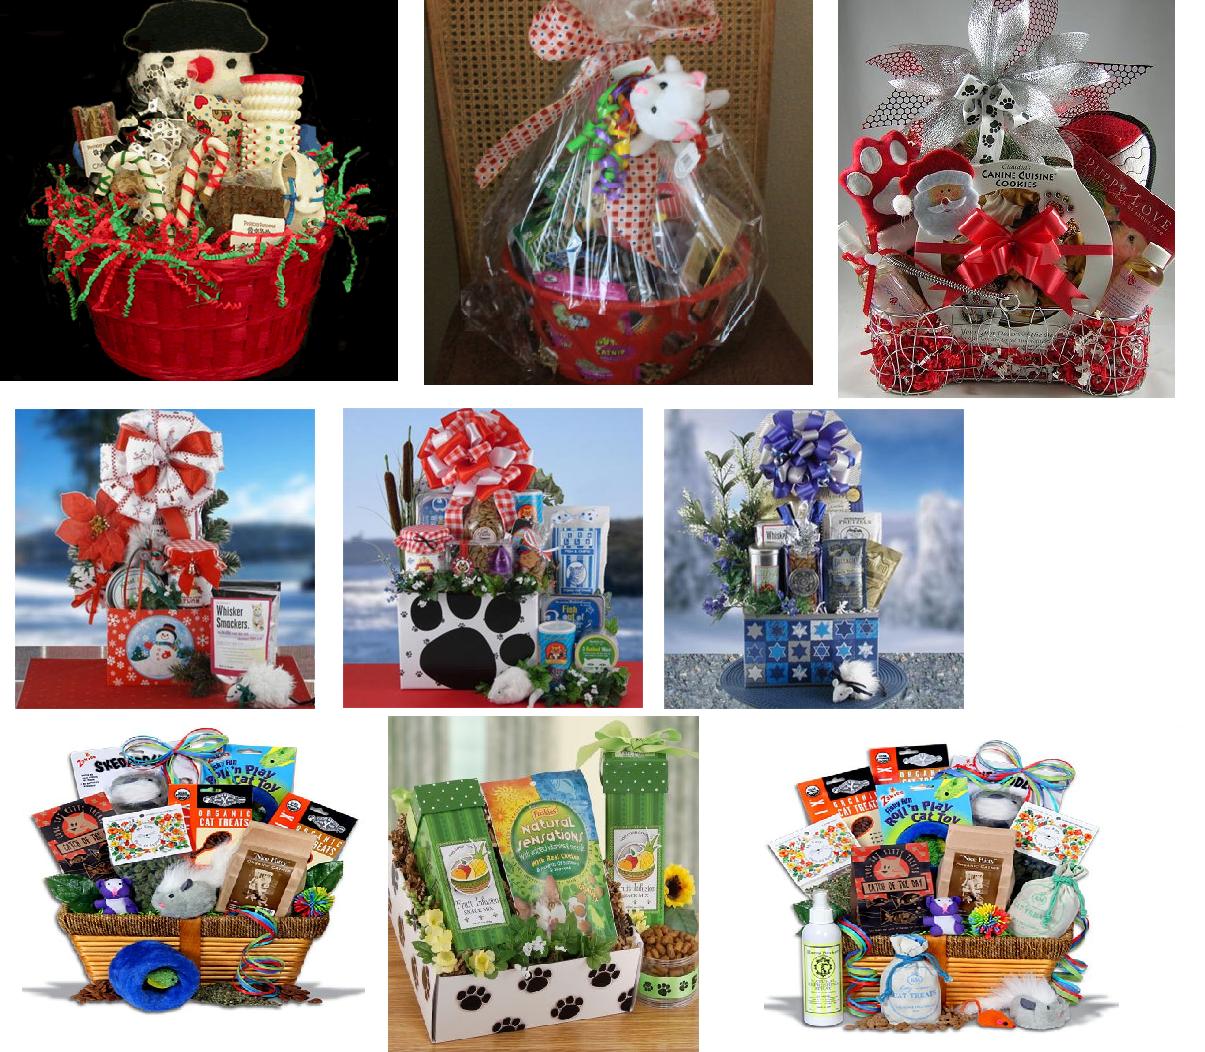 diy amazing Christmas gift basket ideas | ... Martha Stewart has some amazing DIY cat toy projects. Martha's Ideas